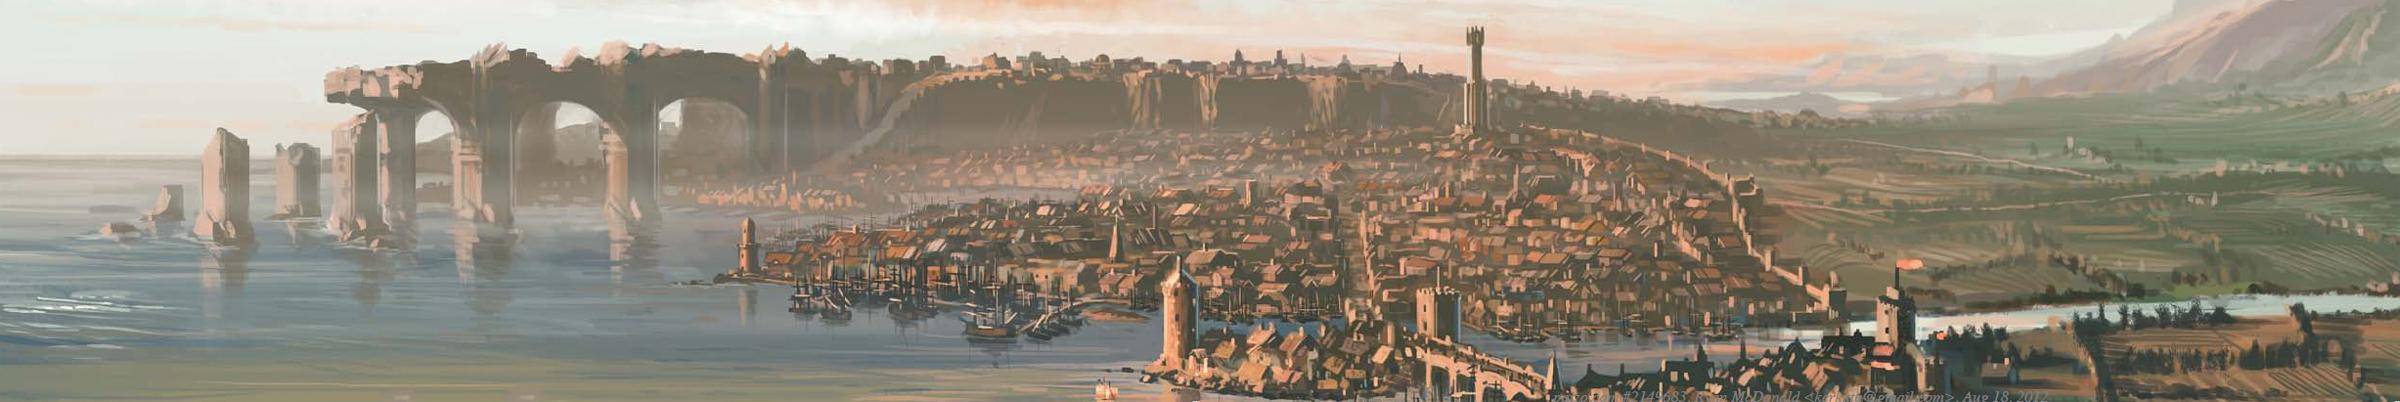 Magnimar cityscape